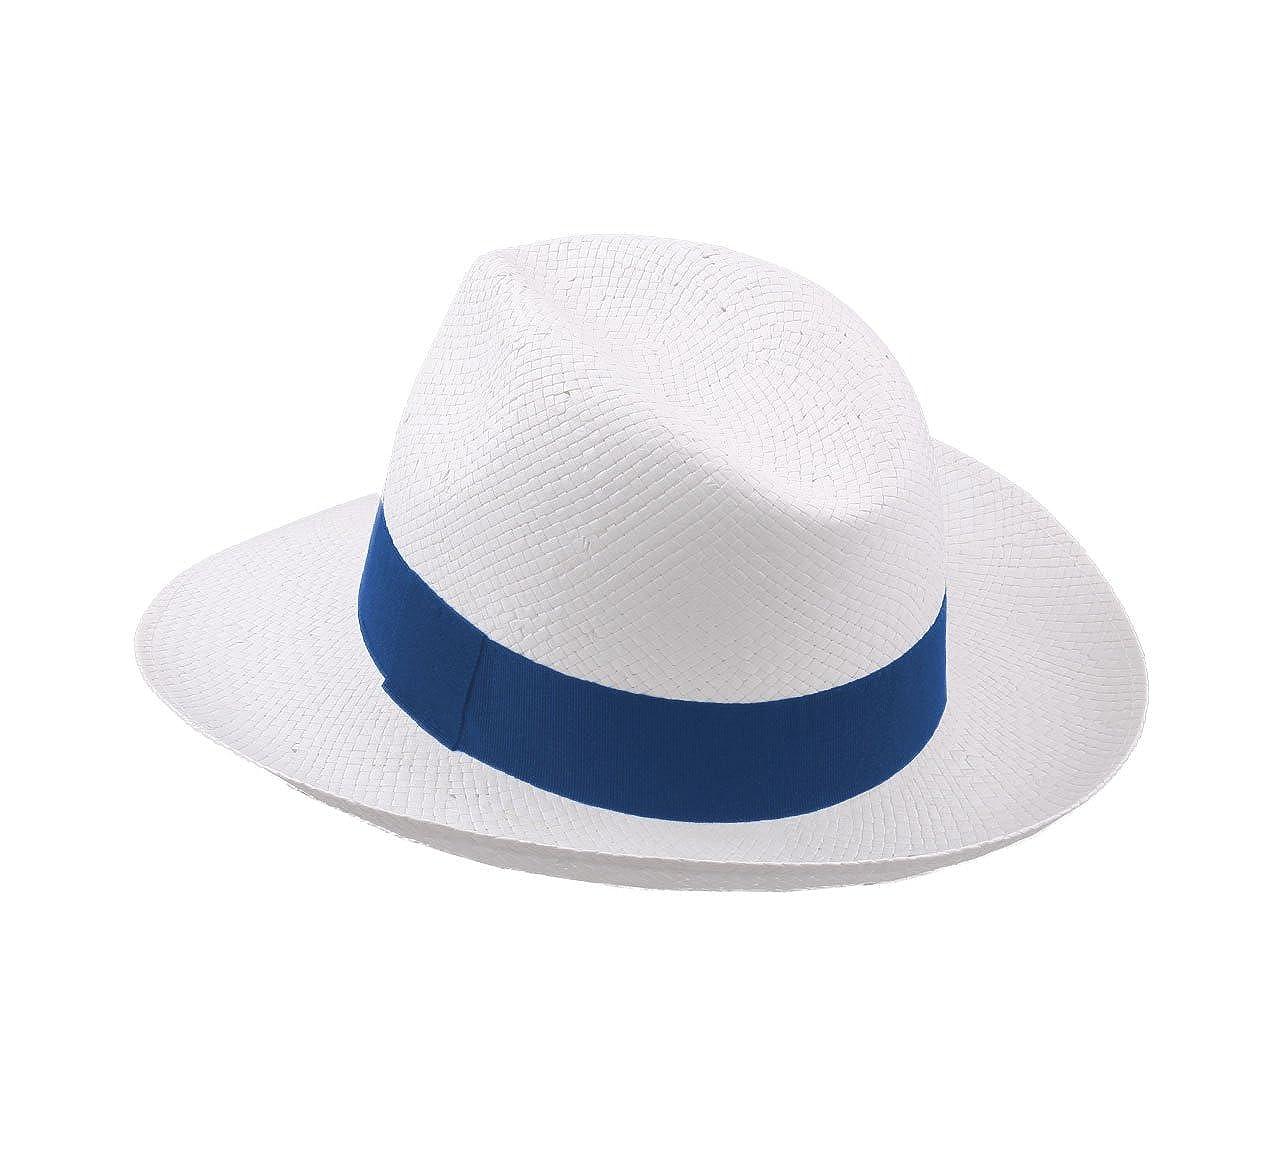 Marky Banes Fedora Hat